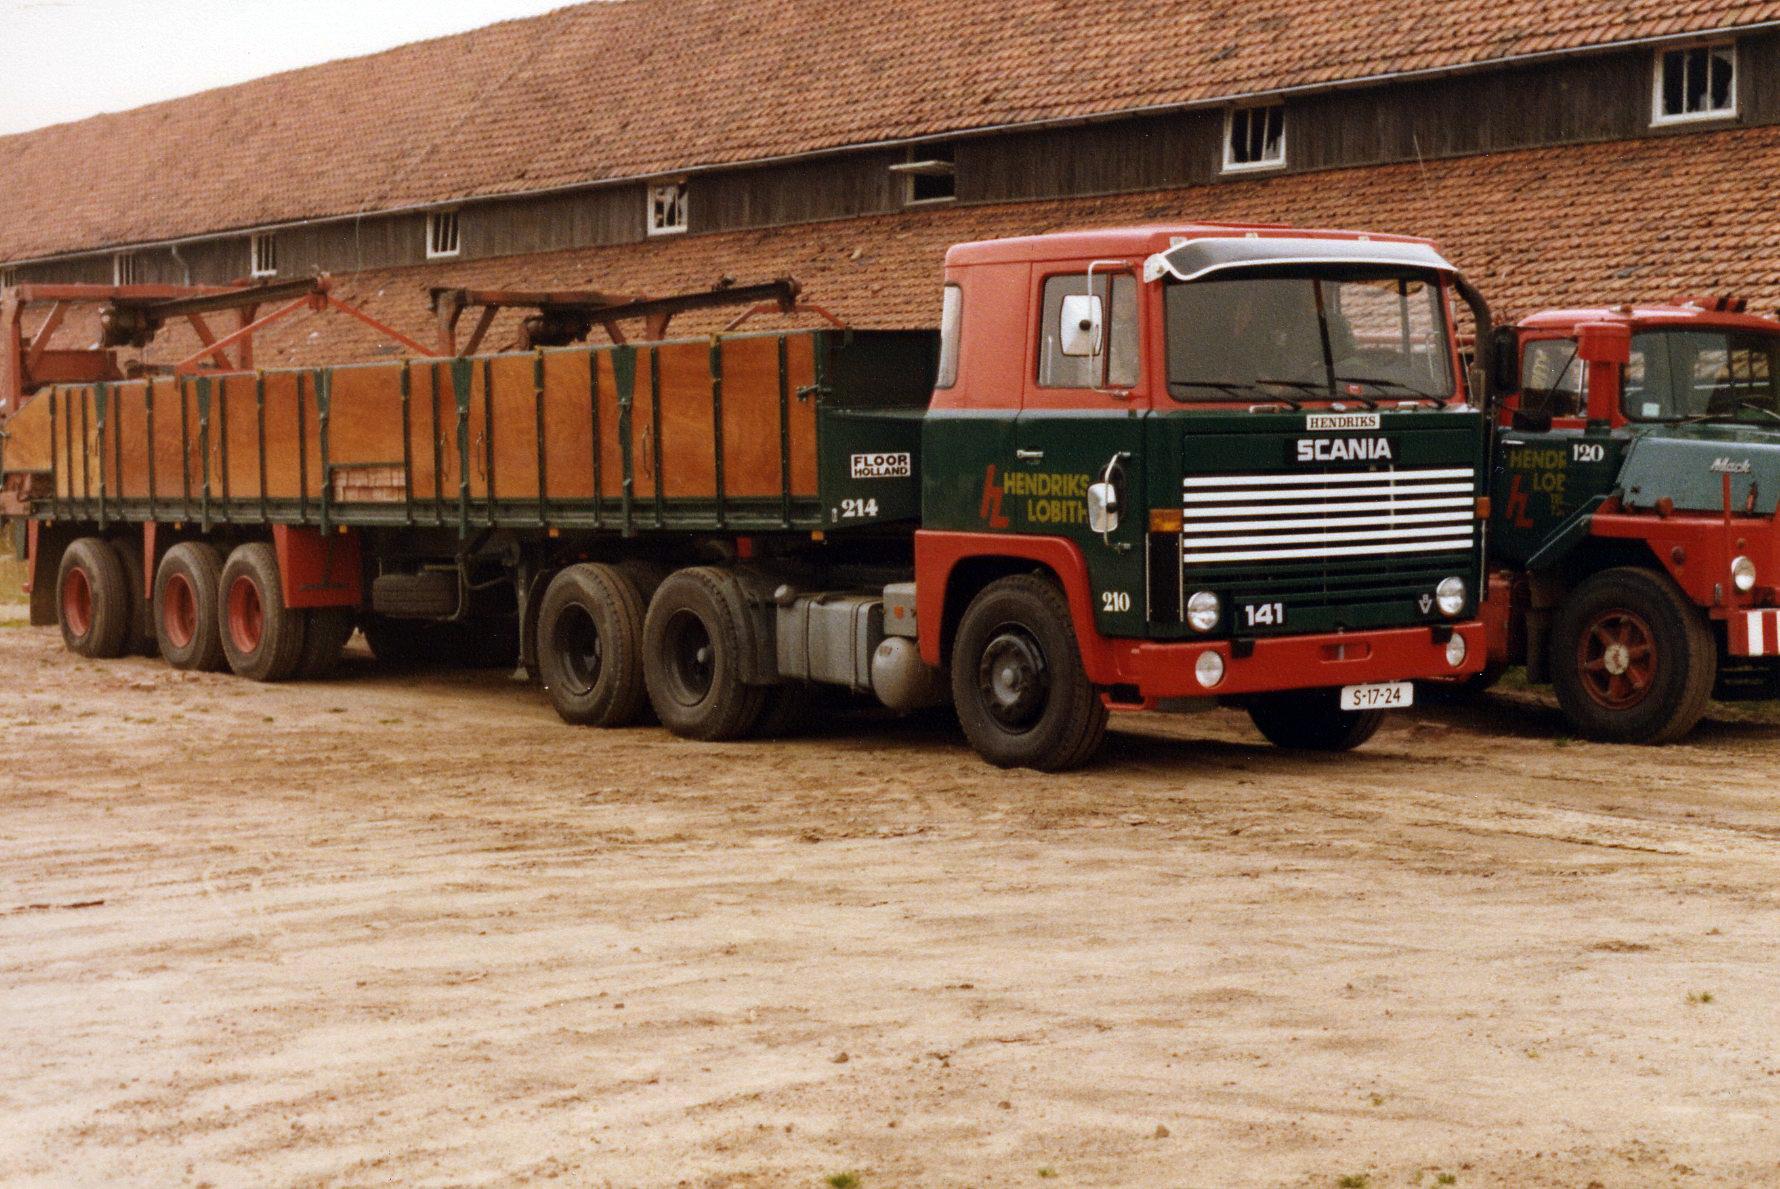 Hendriks-Lobith-Scania-LB141-S1724